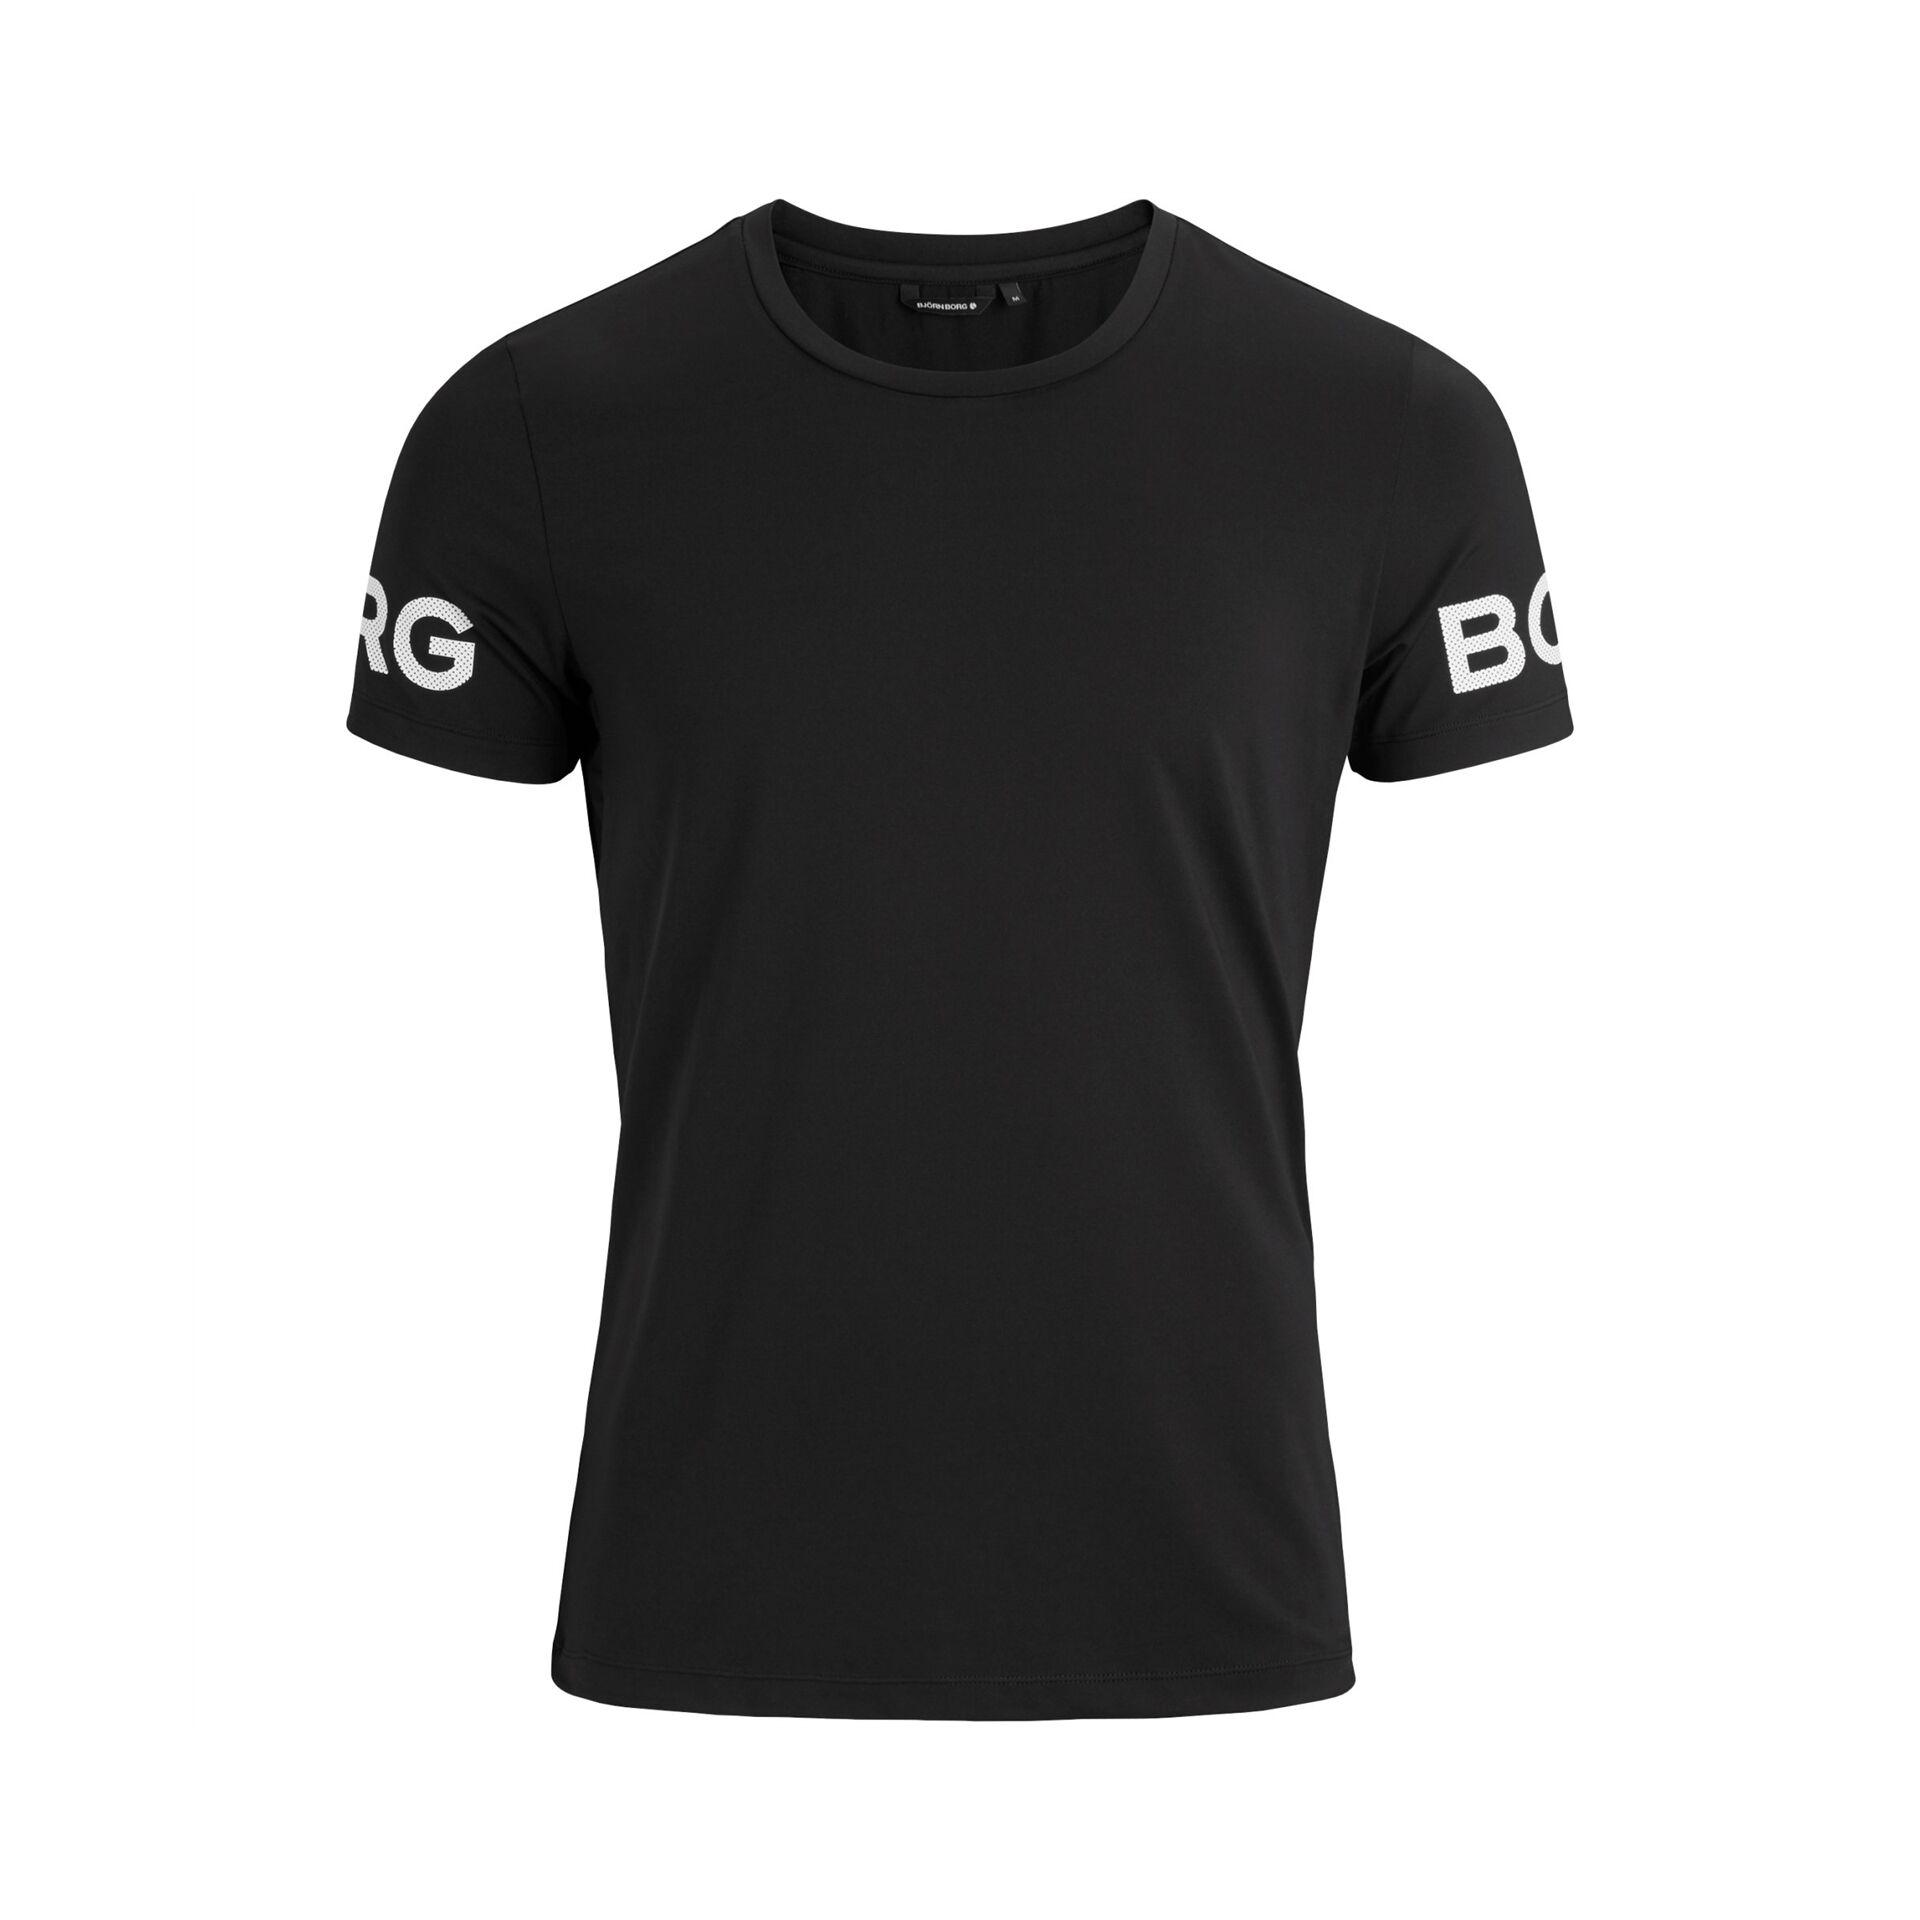 Björn Borg Tee Black Beauty L